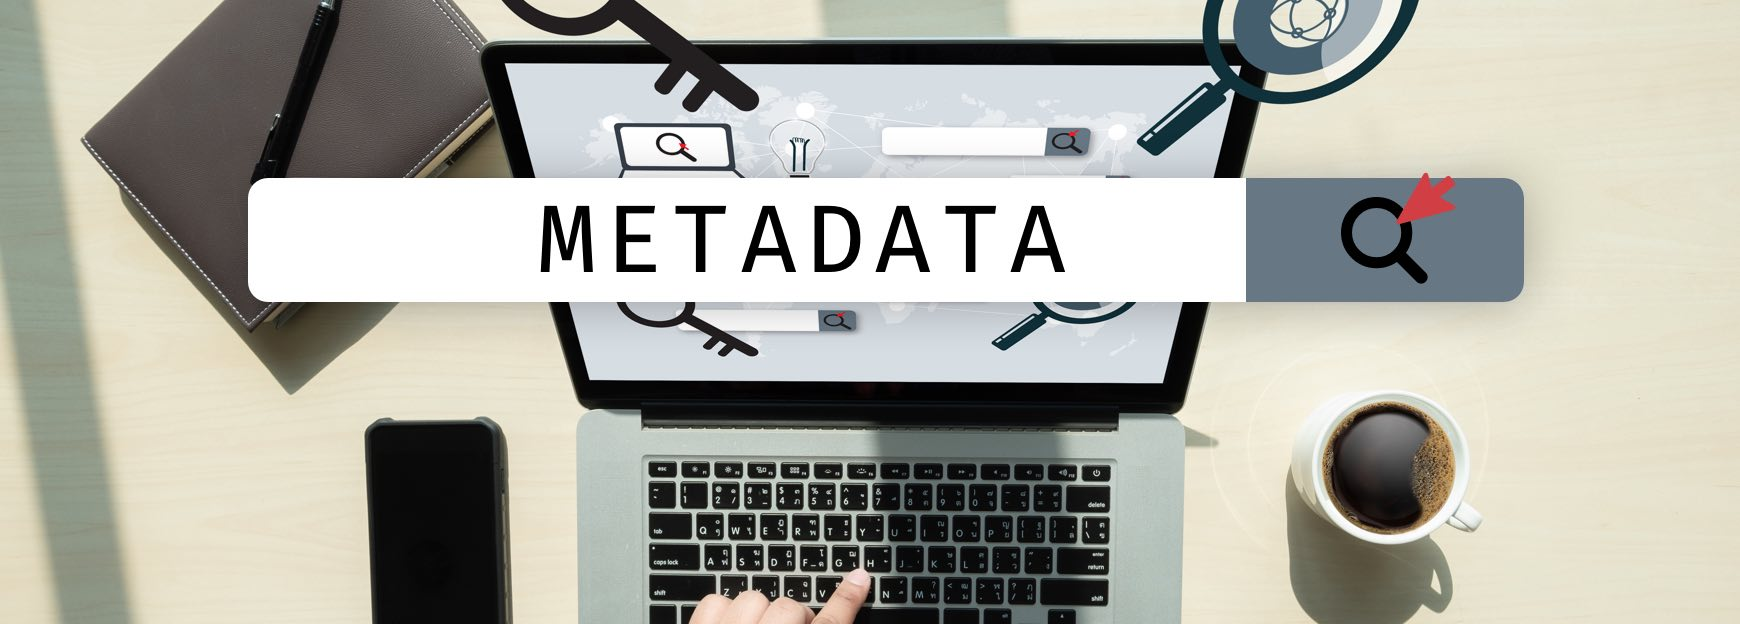 metadata mysteries legal ediscovey